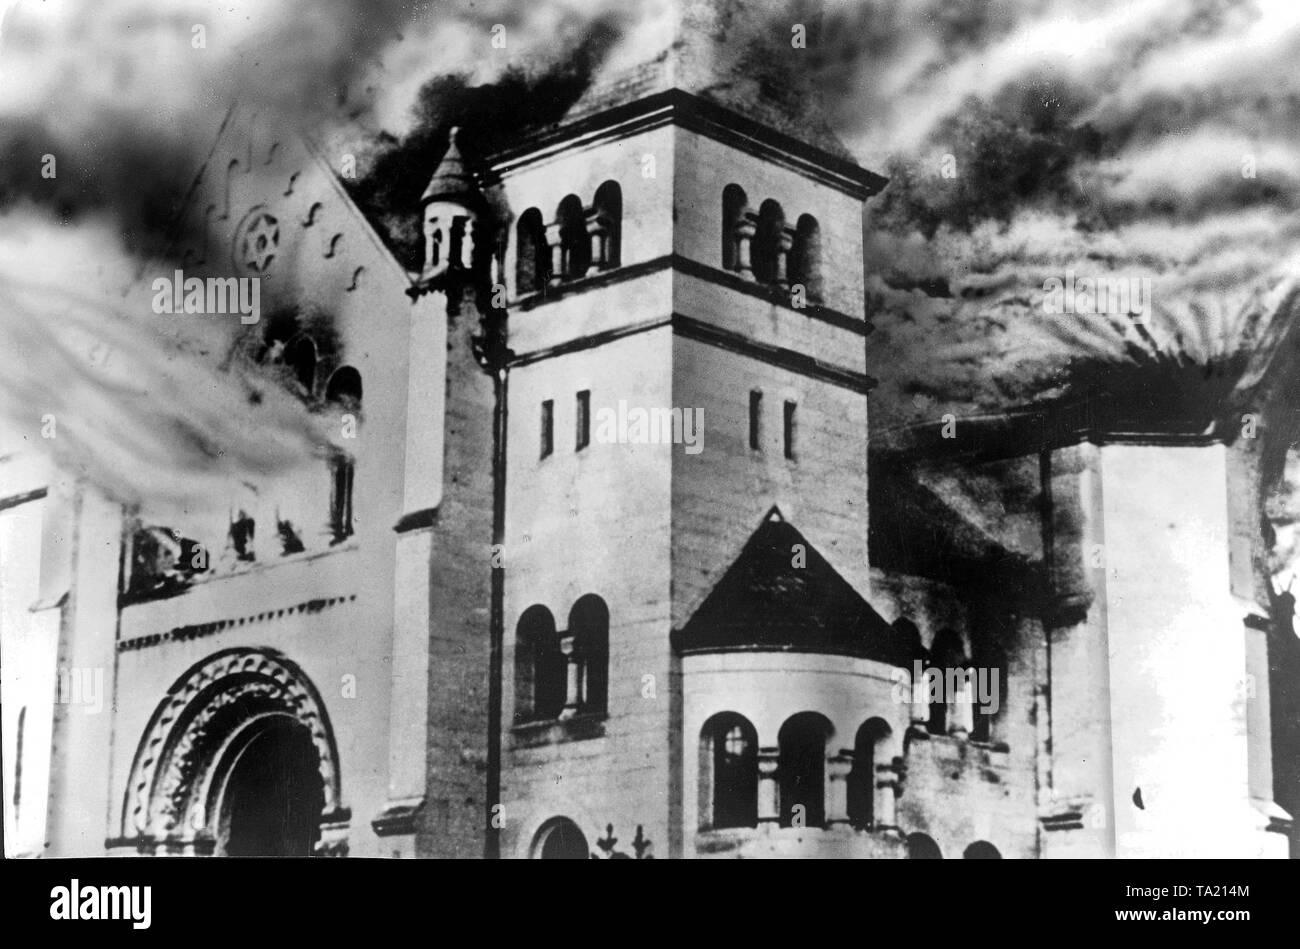 Une synagogue, au cours de la Kristallnacht, Baden-Baden, 9 novembre 1938 (photo n/b) Photo Stock